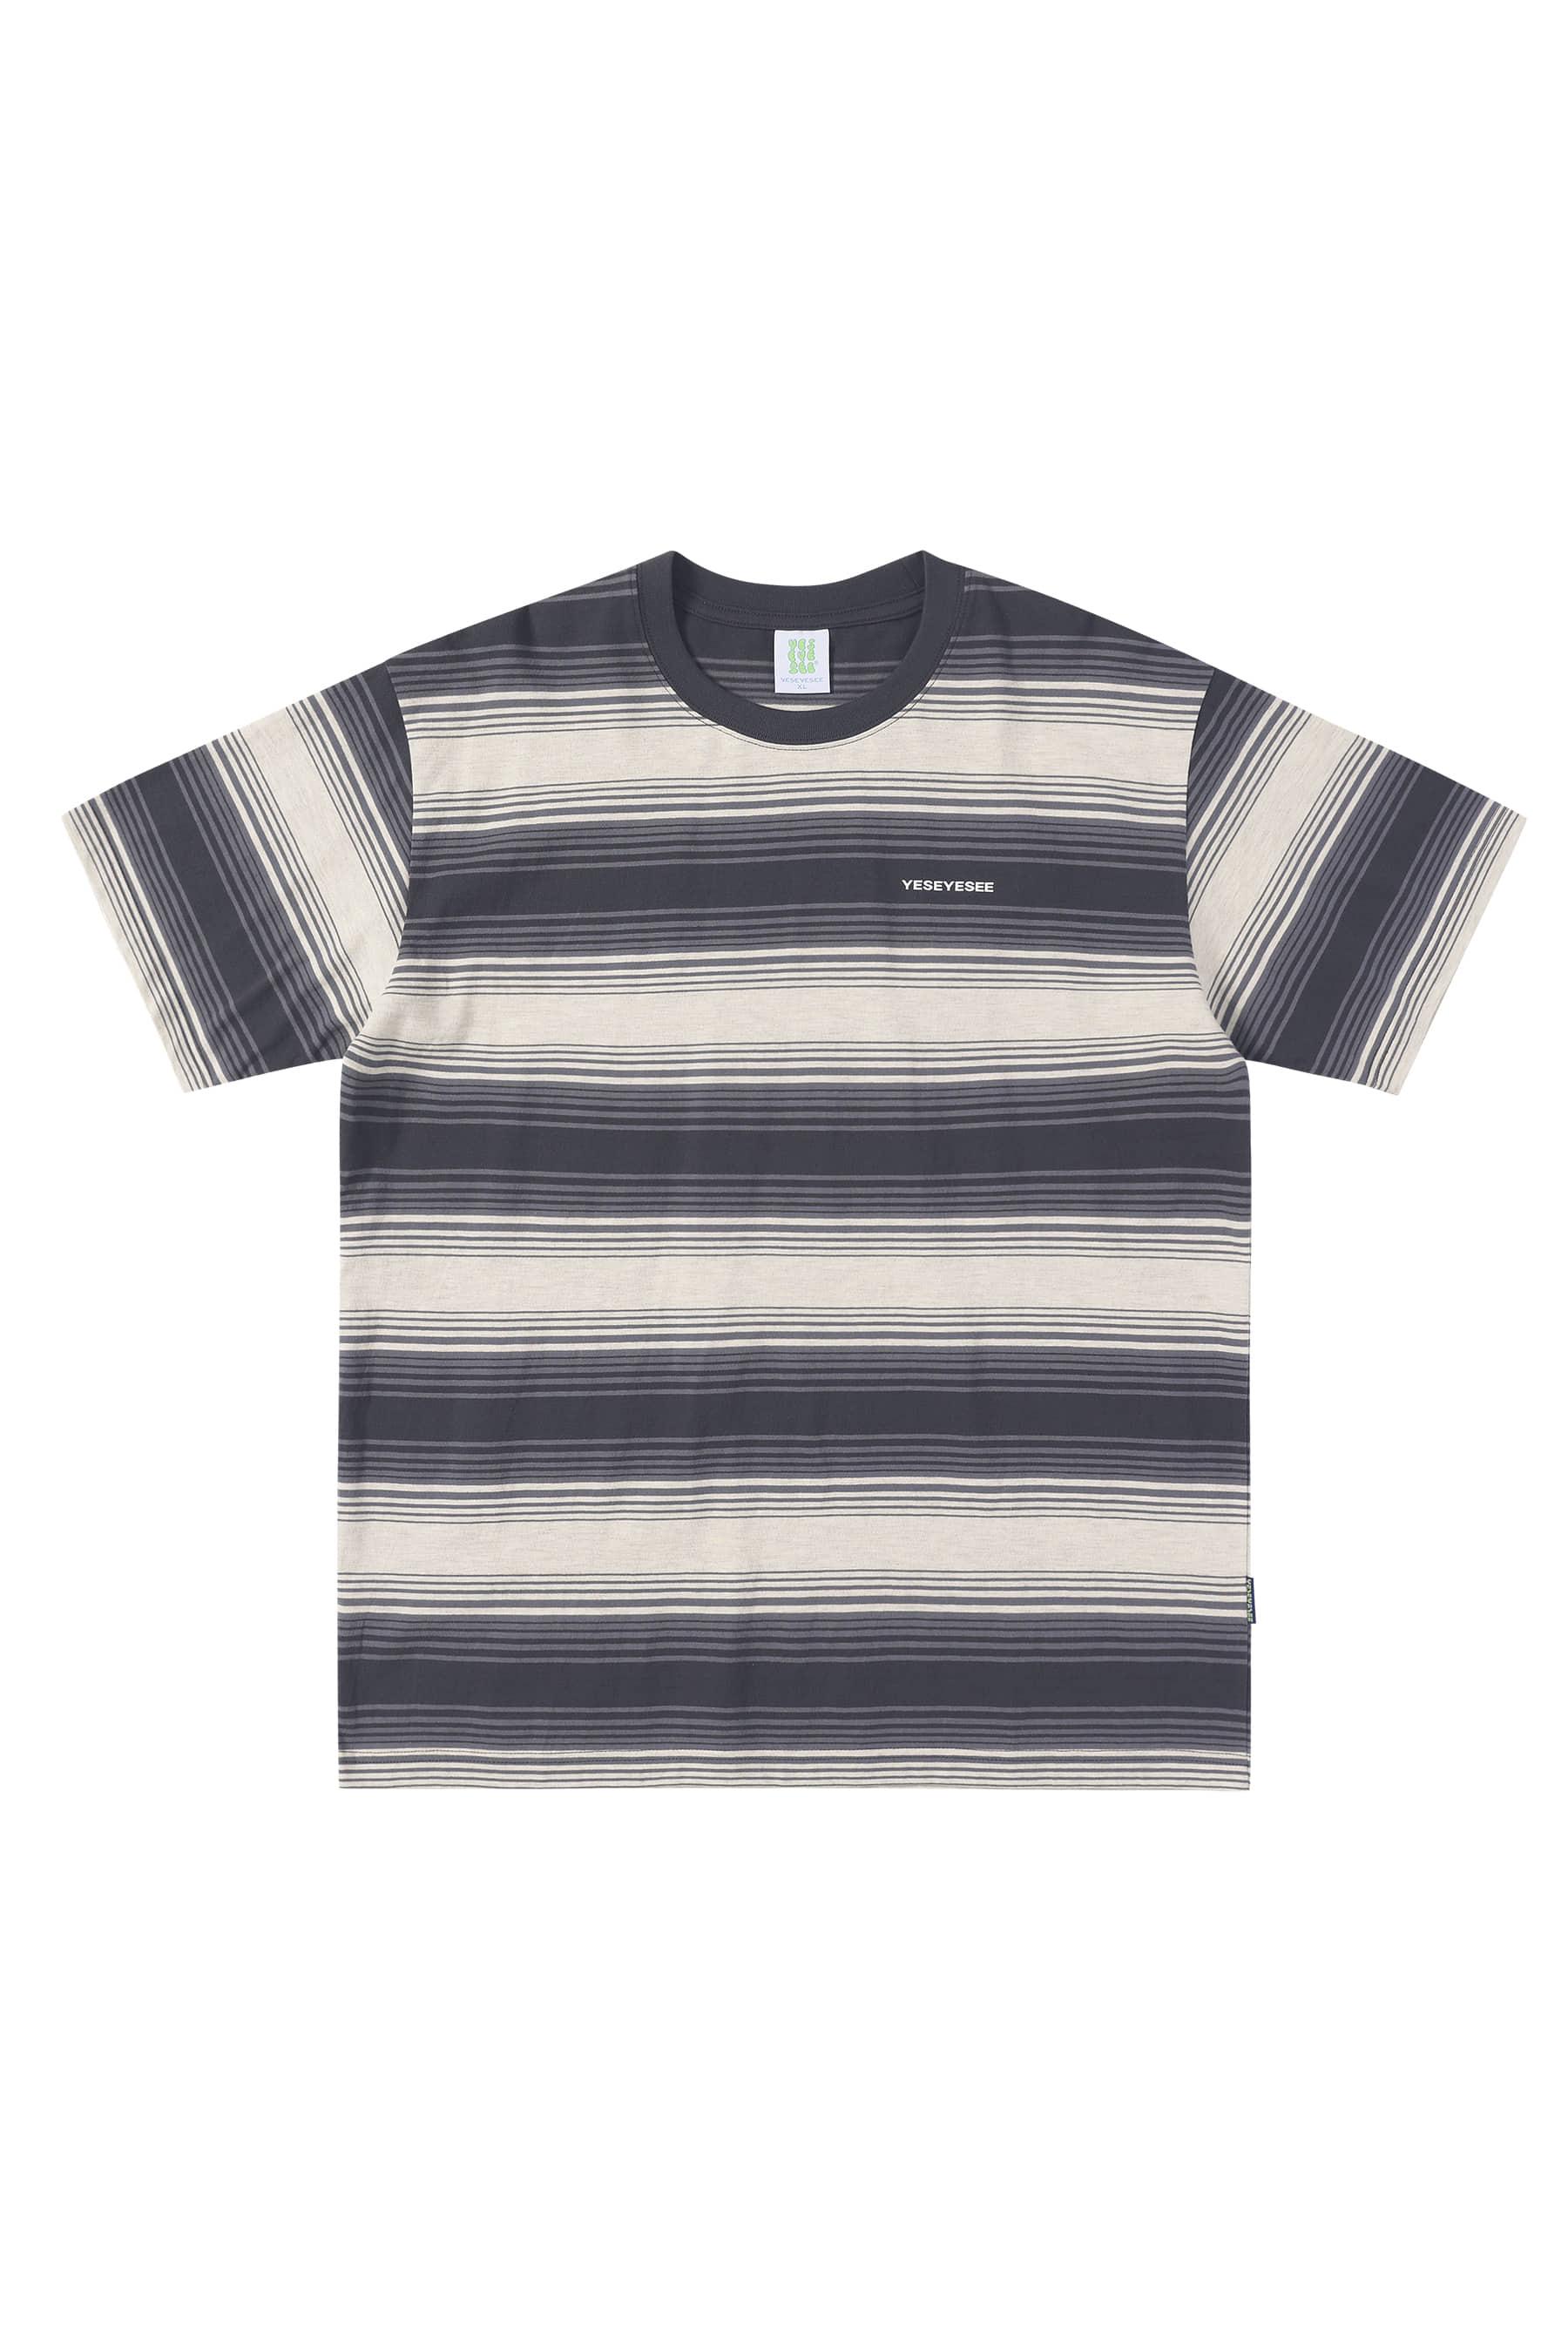 Y.E.S Stripe Tee Grey